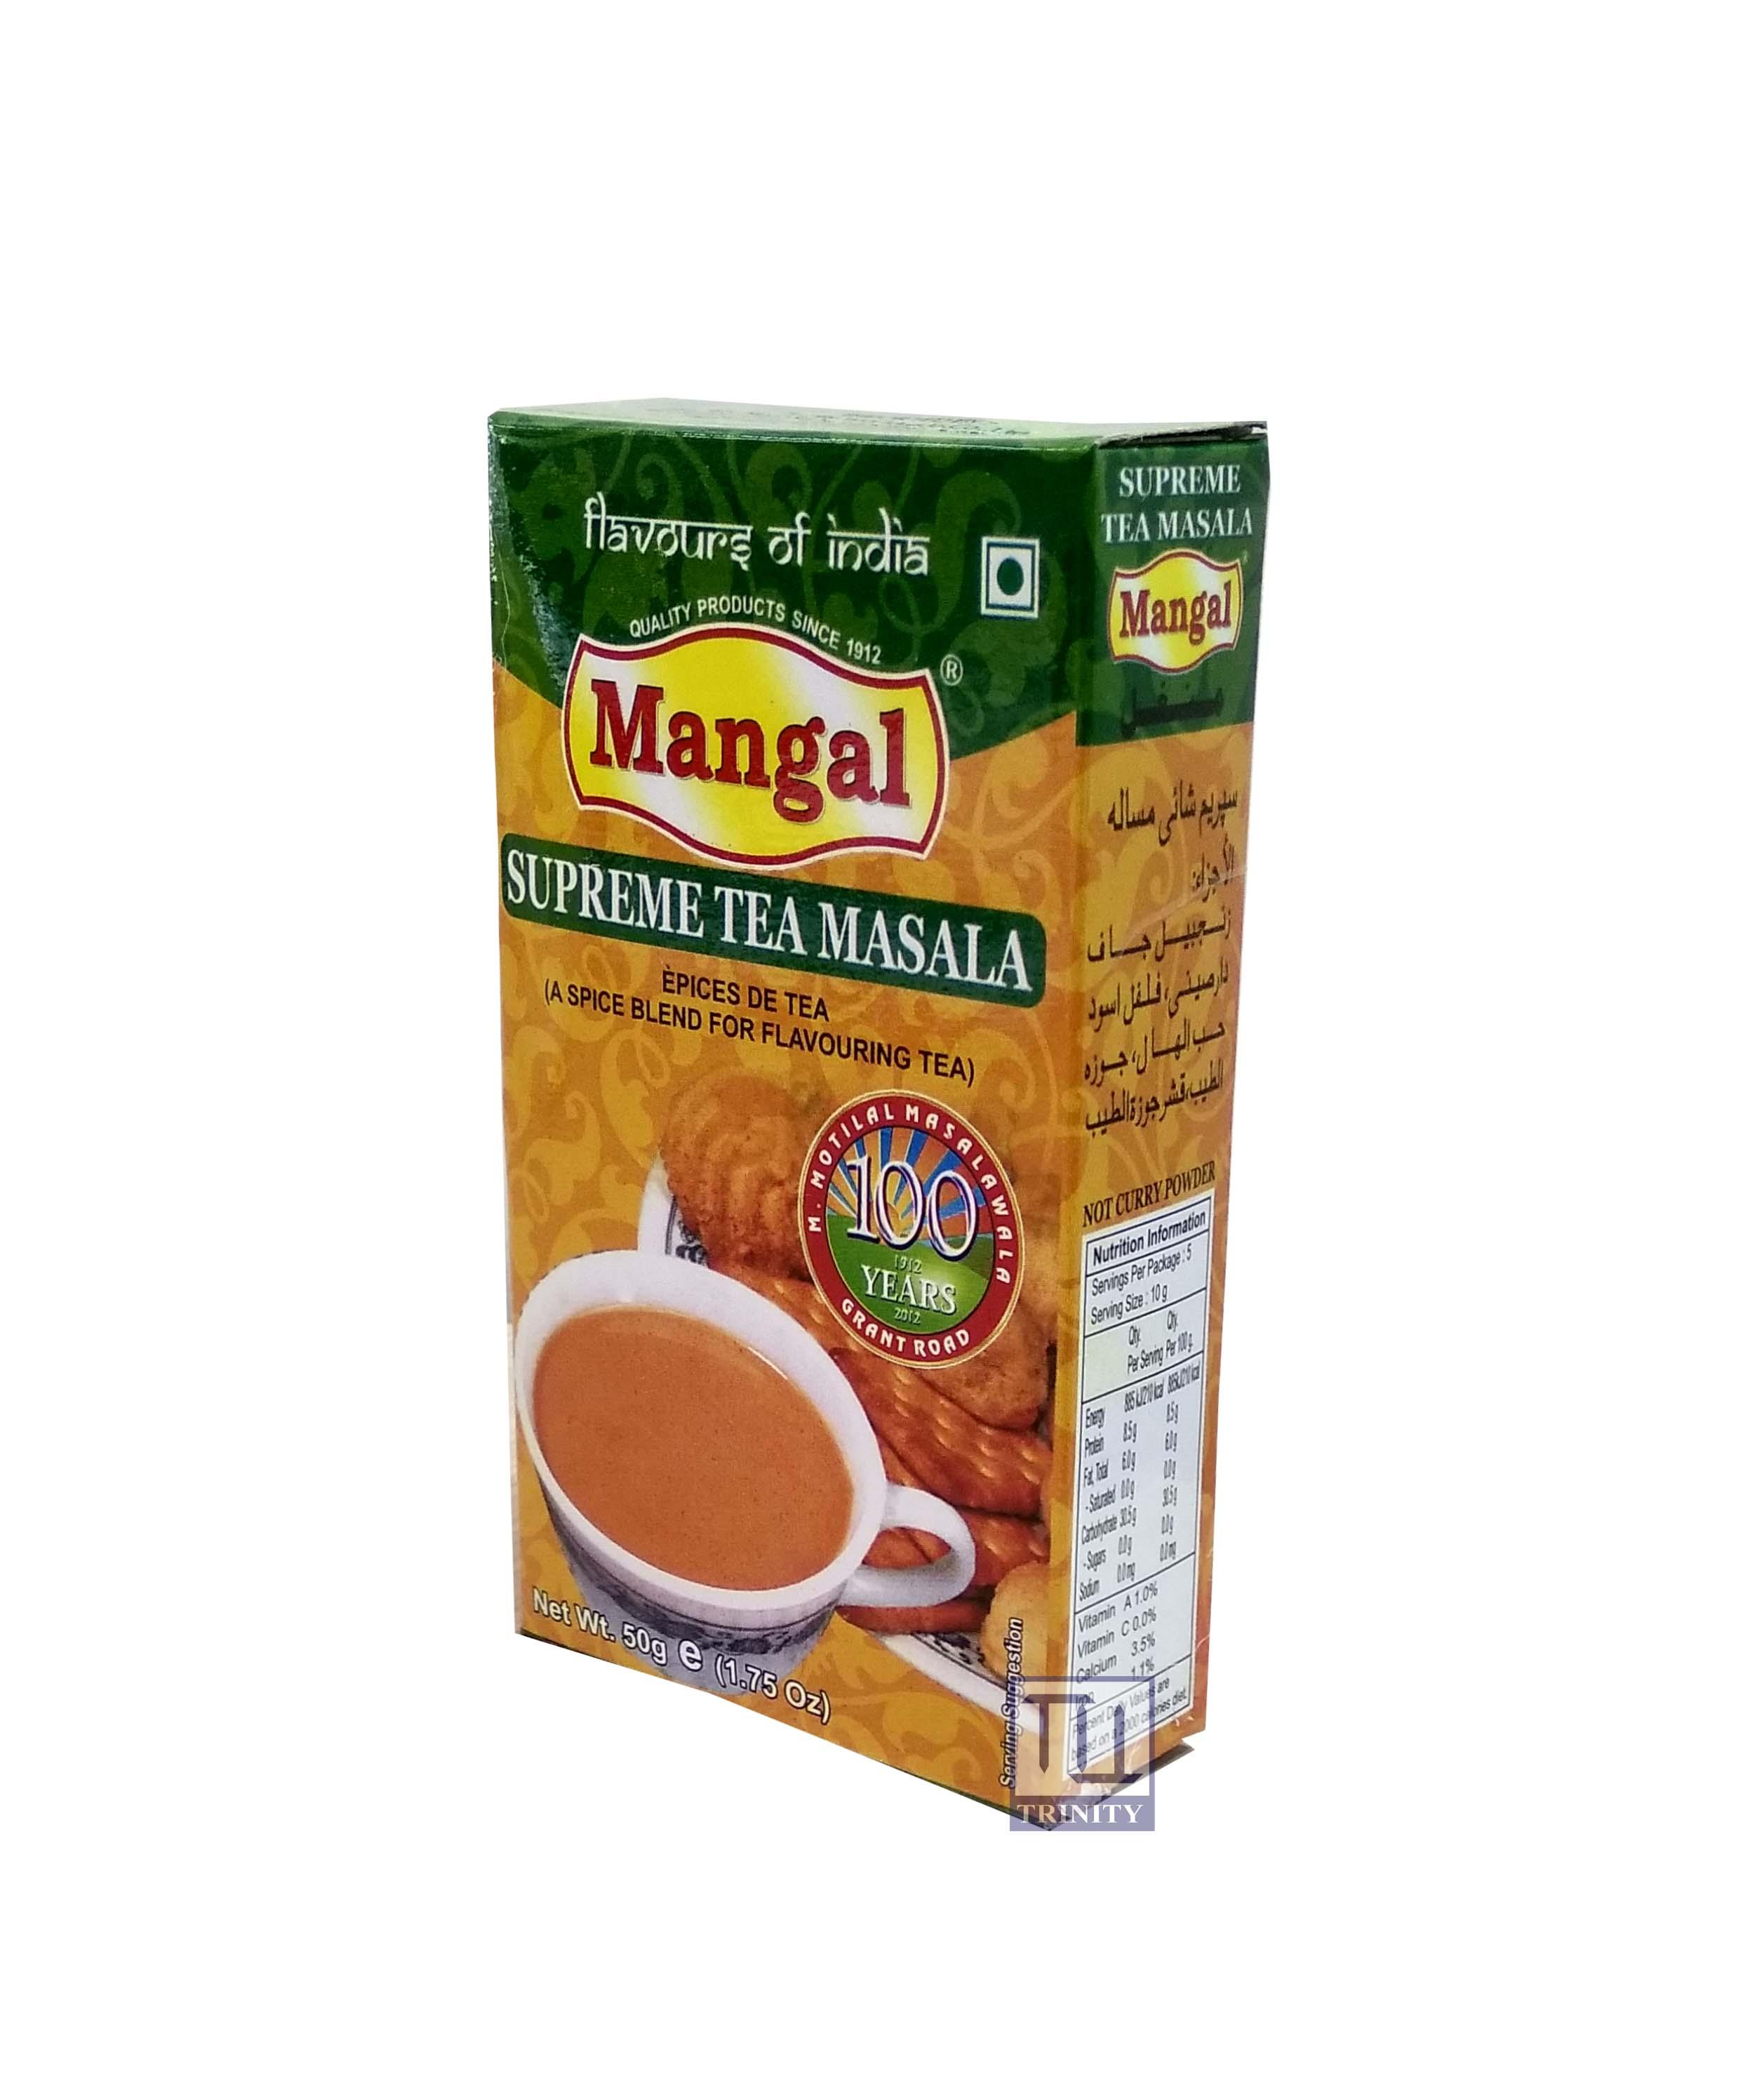 Mangal Supreme Tea Masala  印度香料粉 (煮奶茶用)